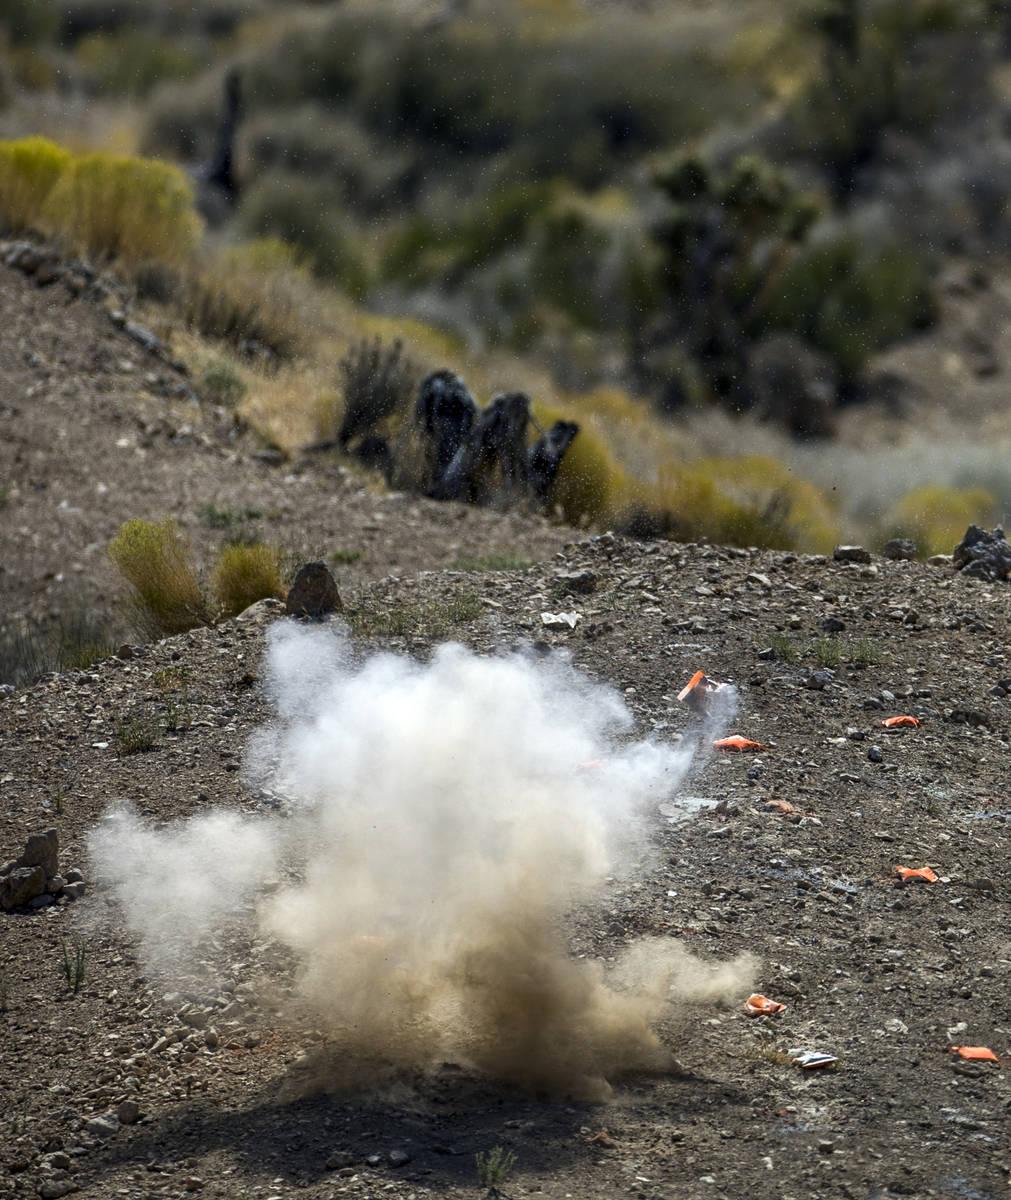 An explosive target blows up on the Adrenaline Mountain gun range, Thursday, Sept. 10, 2020, in ...